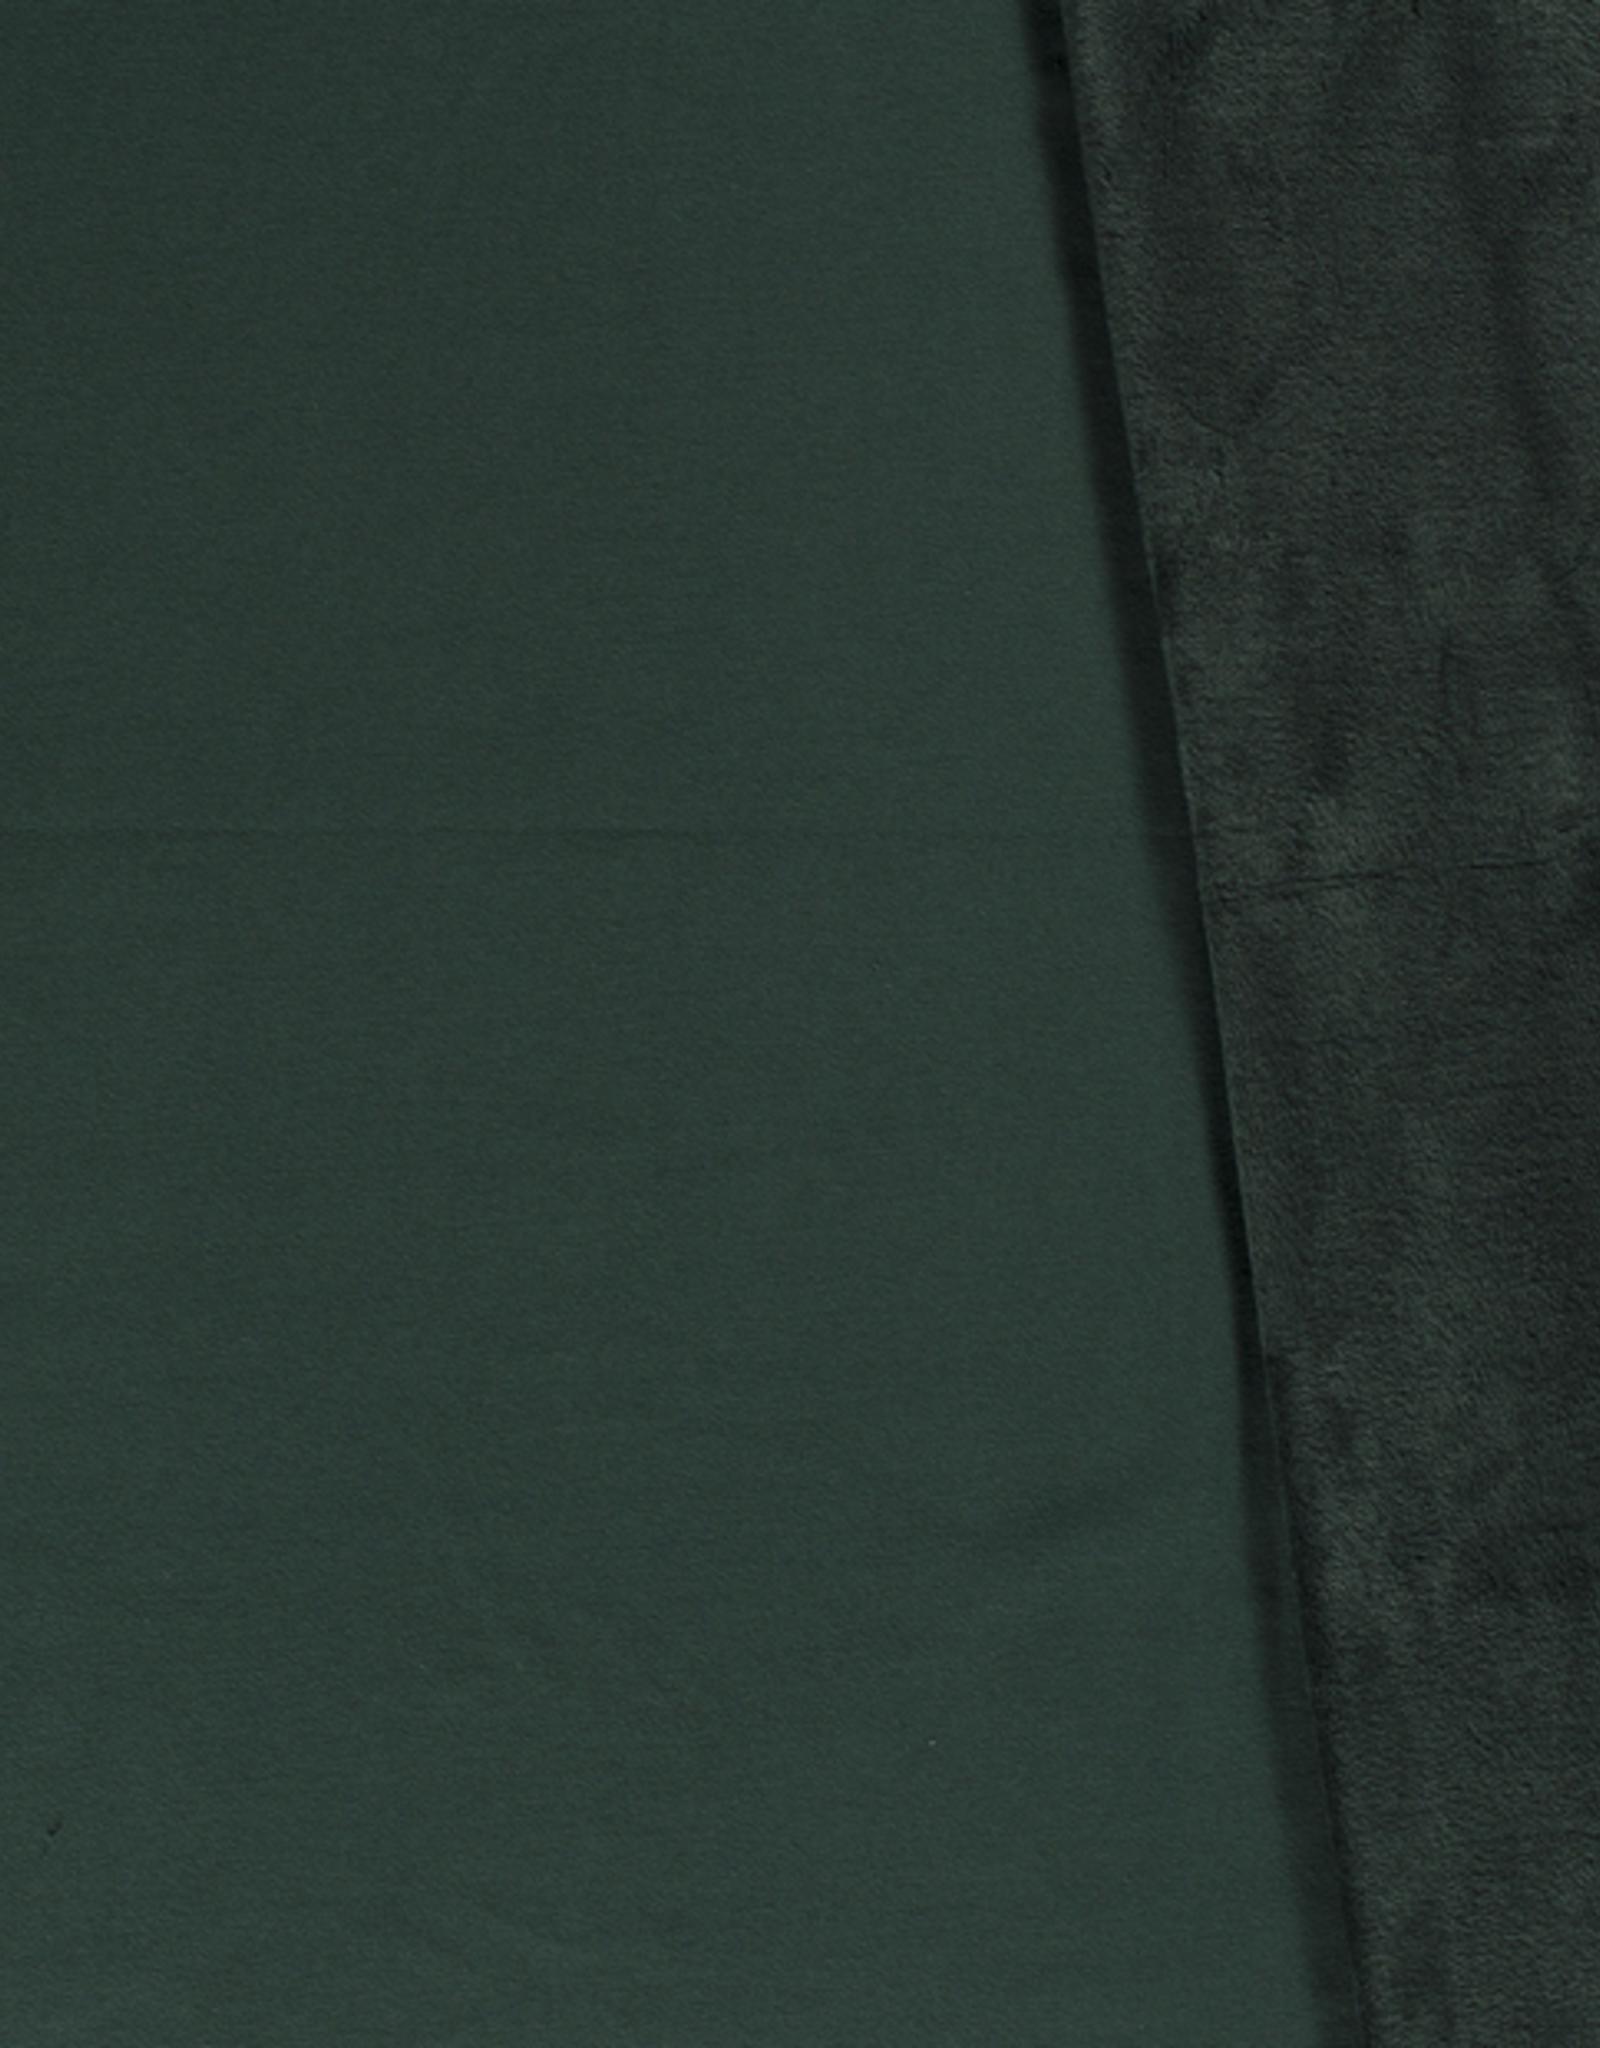 Alpenfleece donkergroen